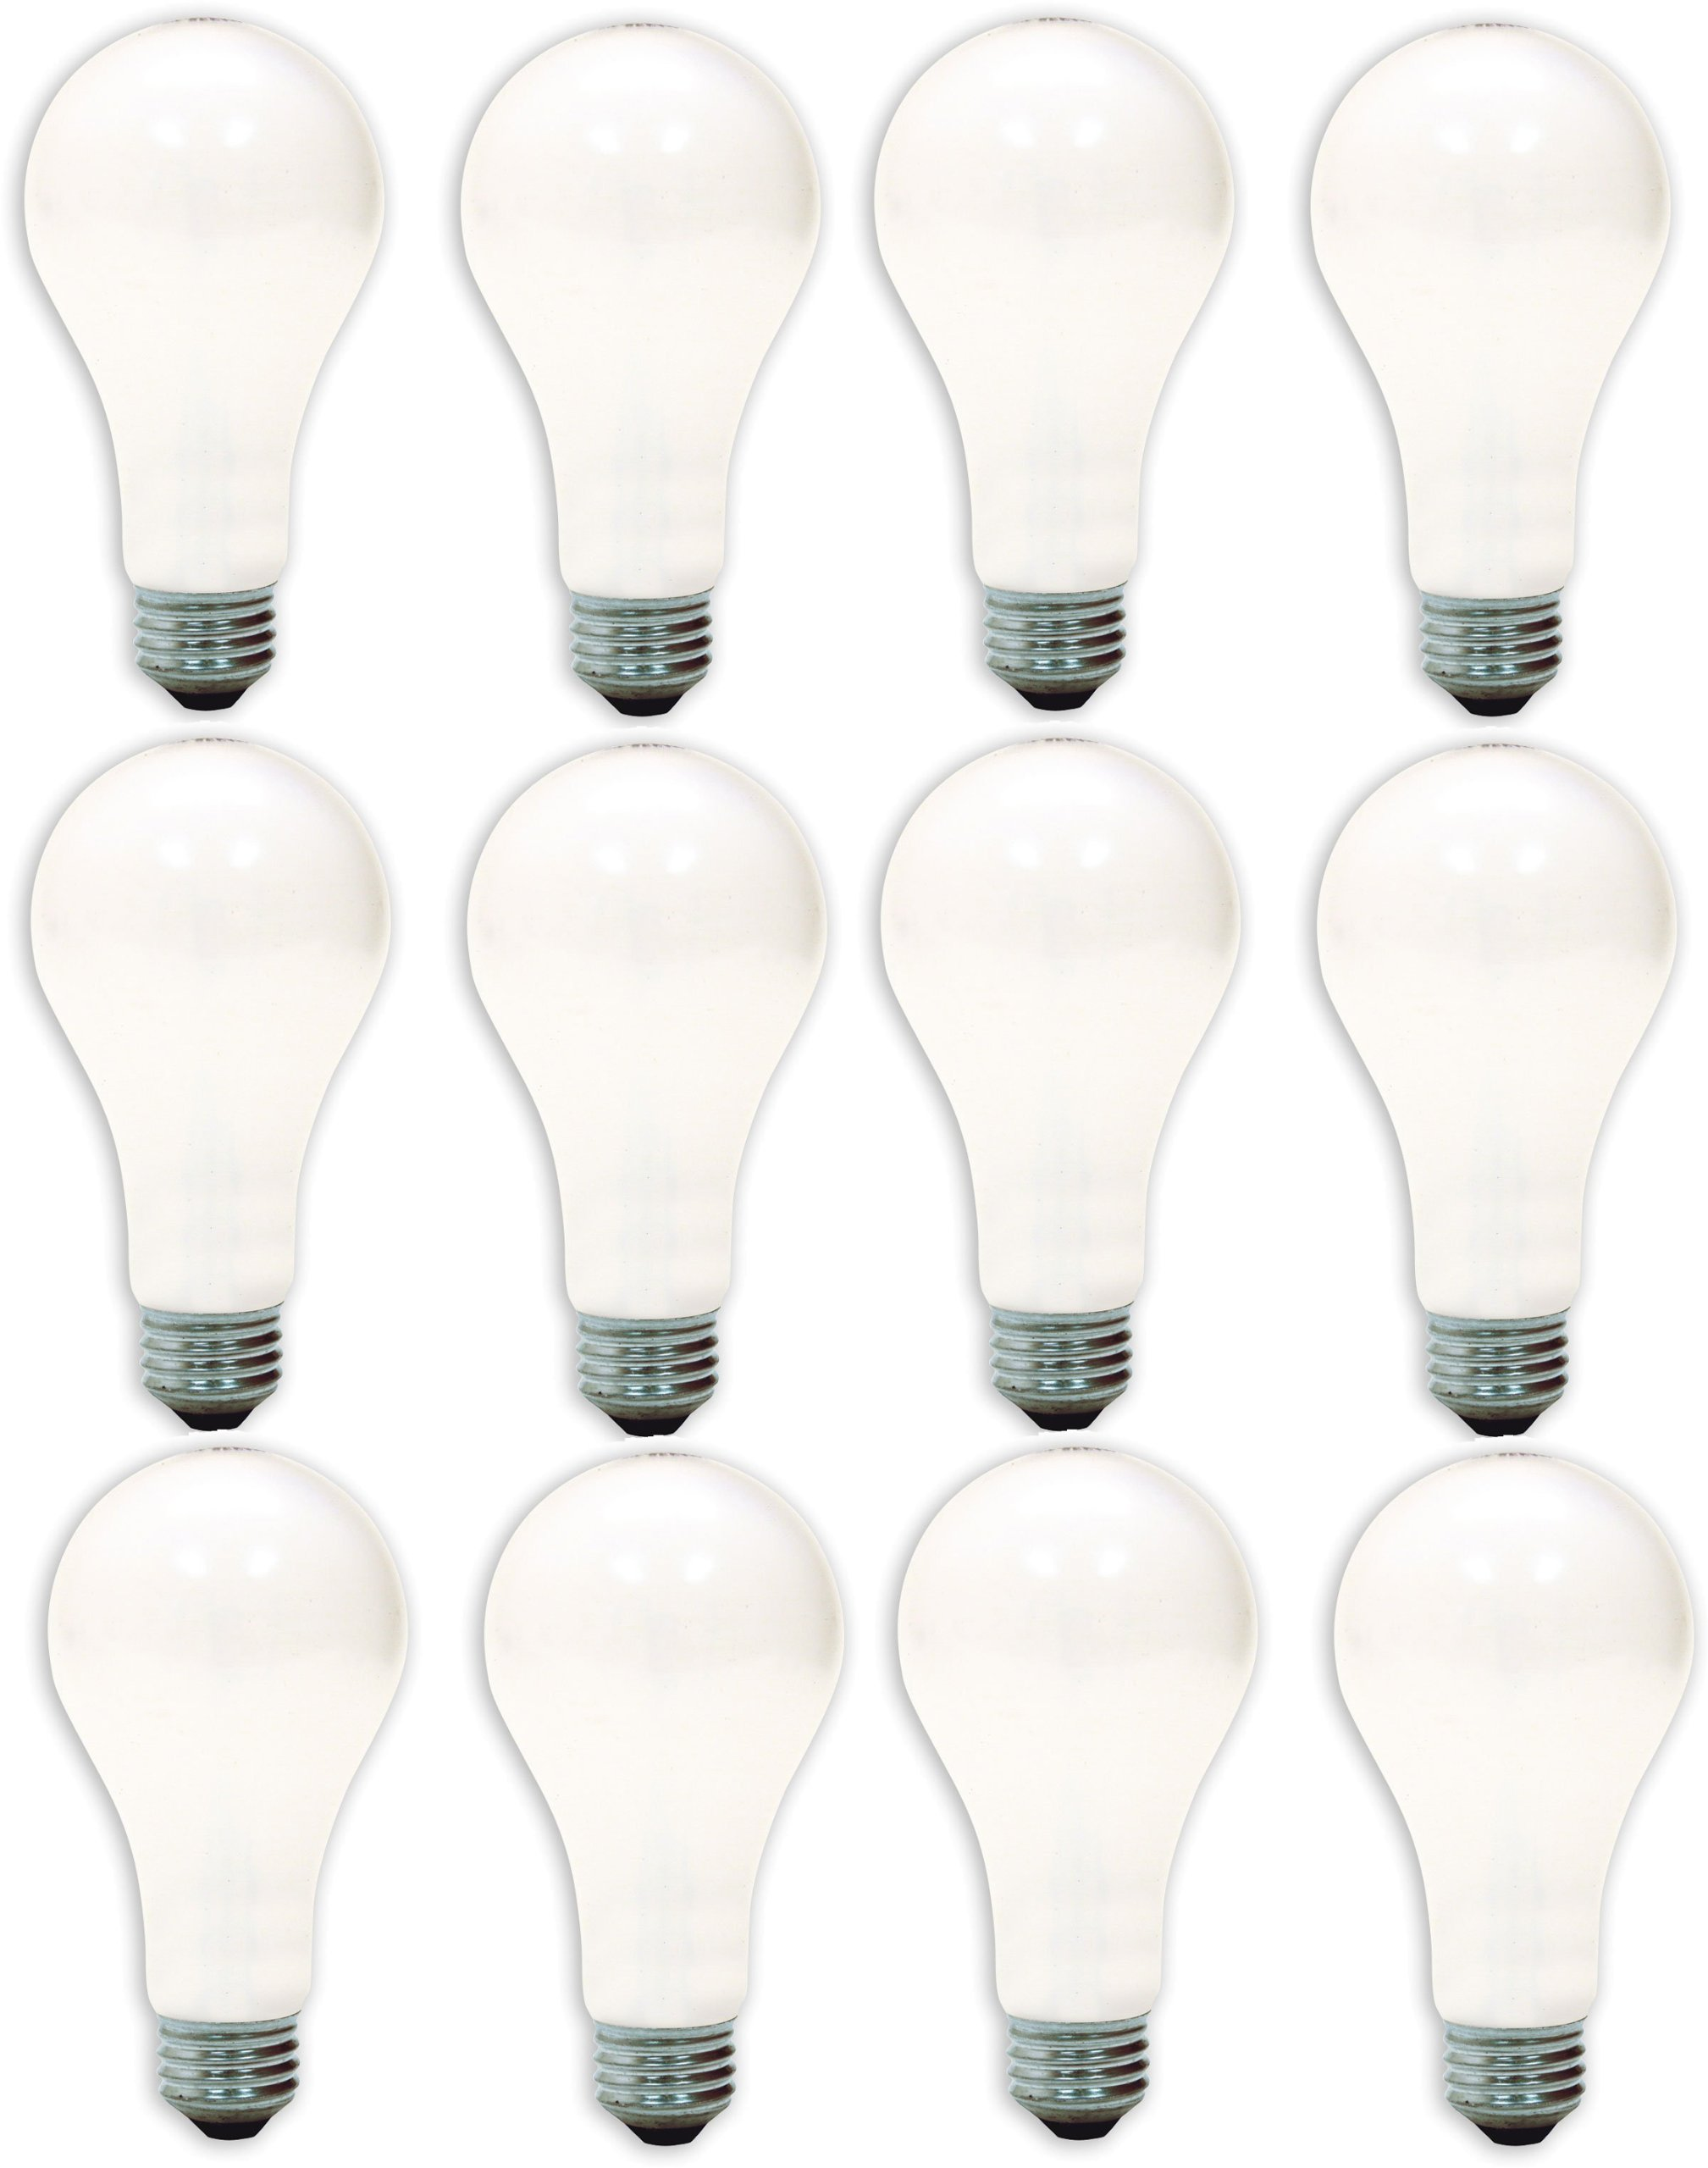 GE Lighting 97482-12 50/200/250-Watt A21 3-Way Soft White Light Bulb, 12-Pack